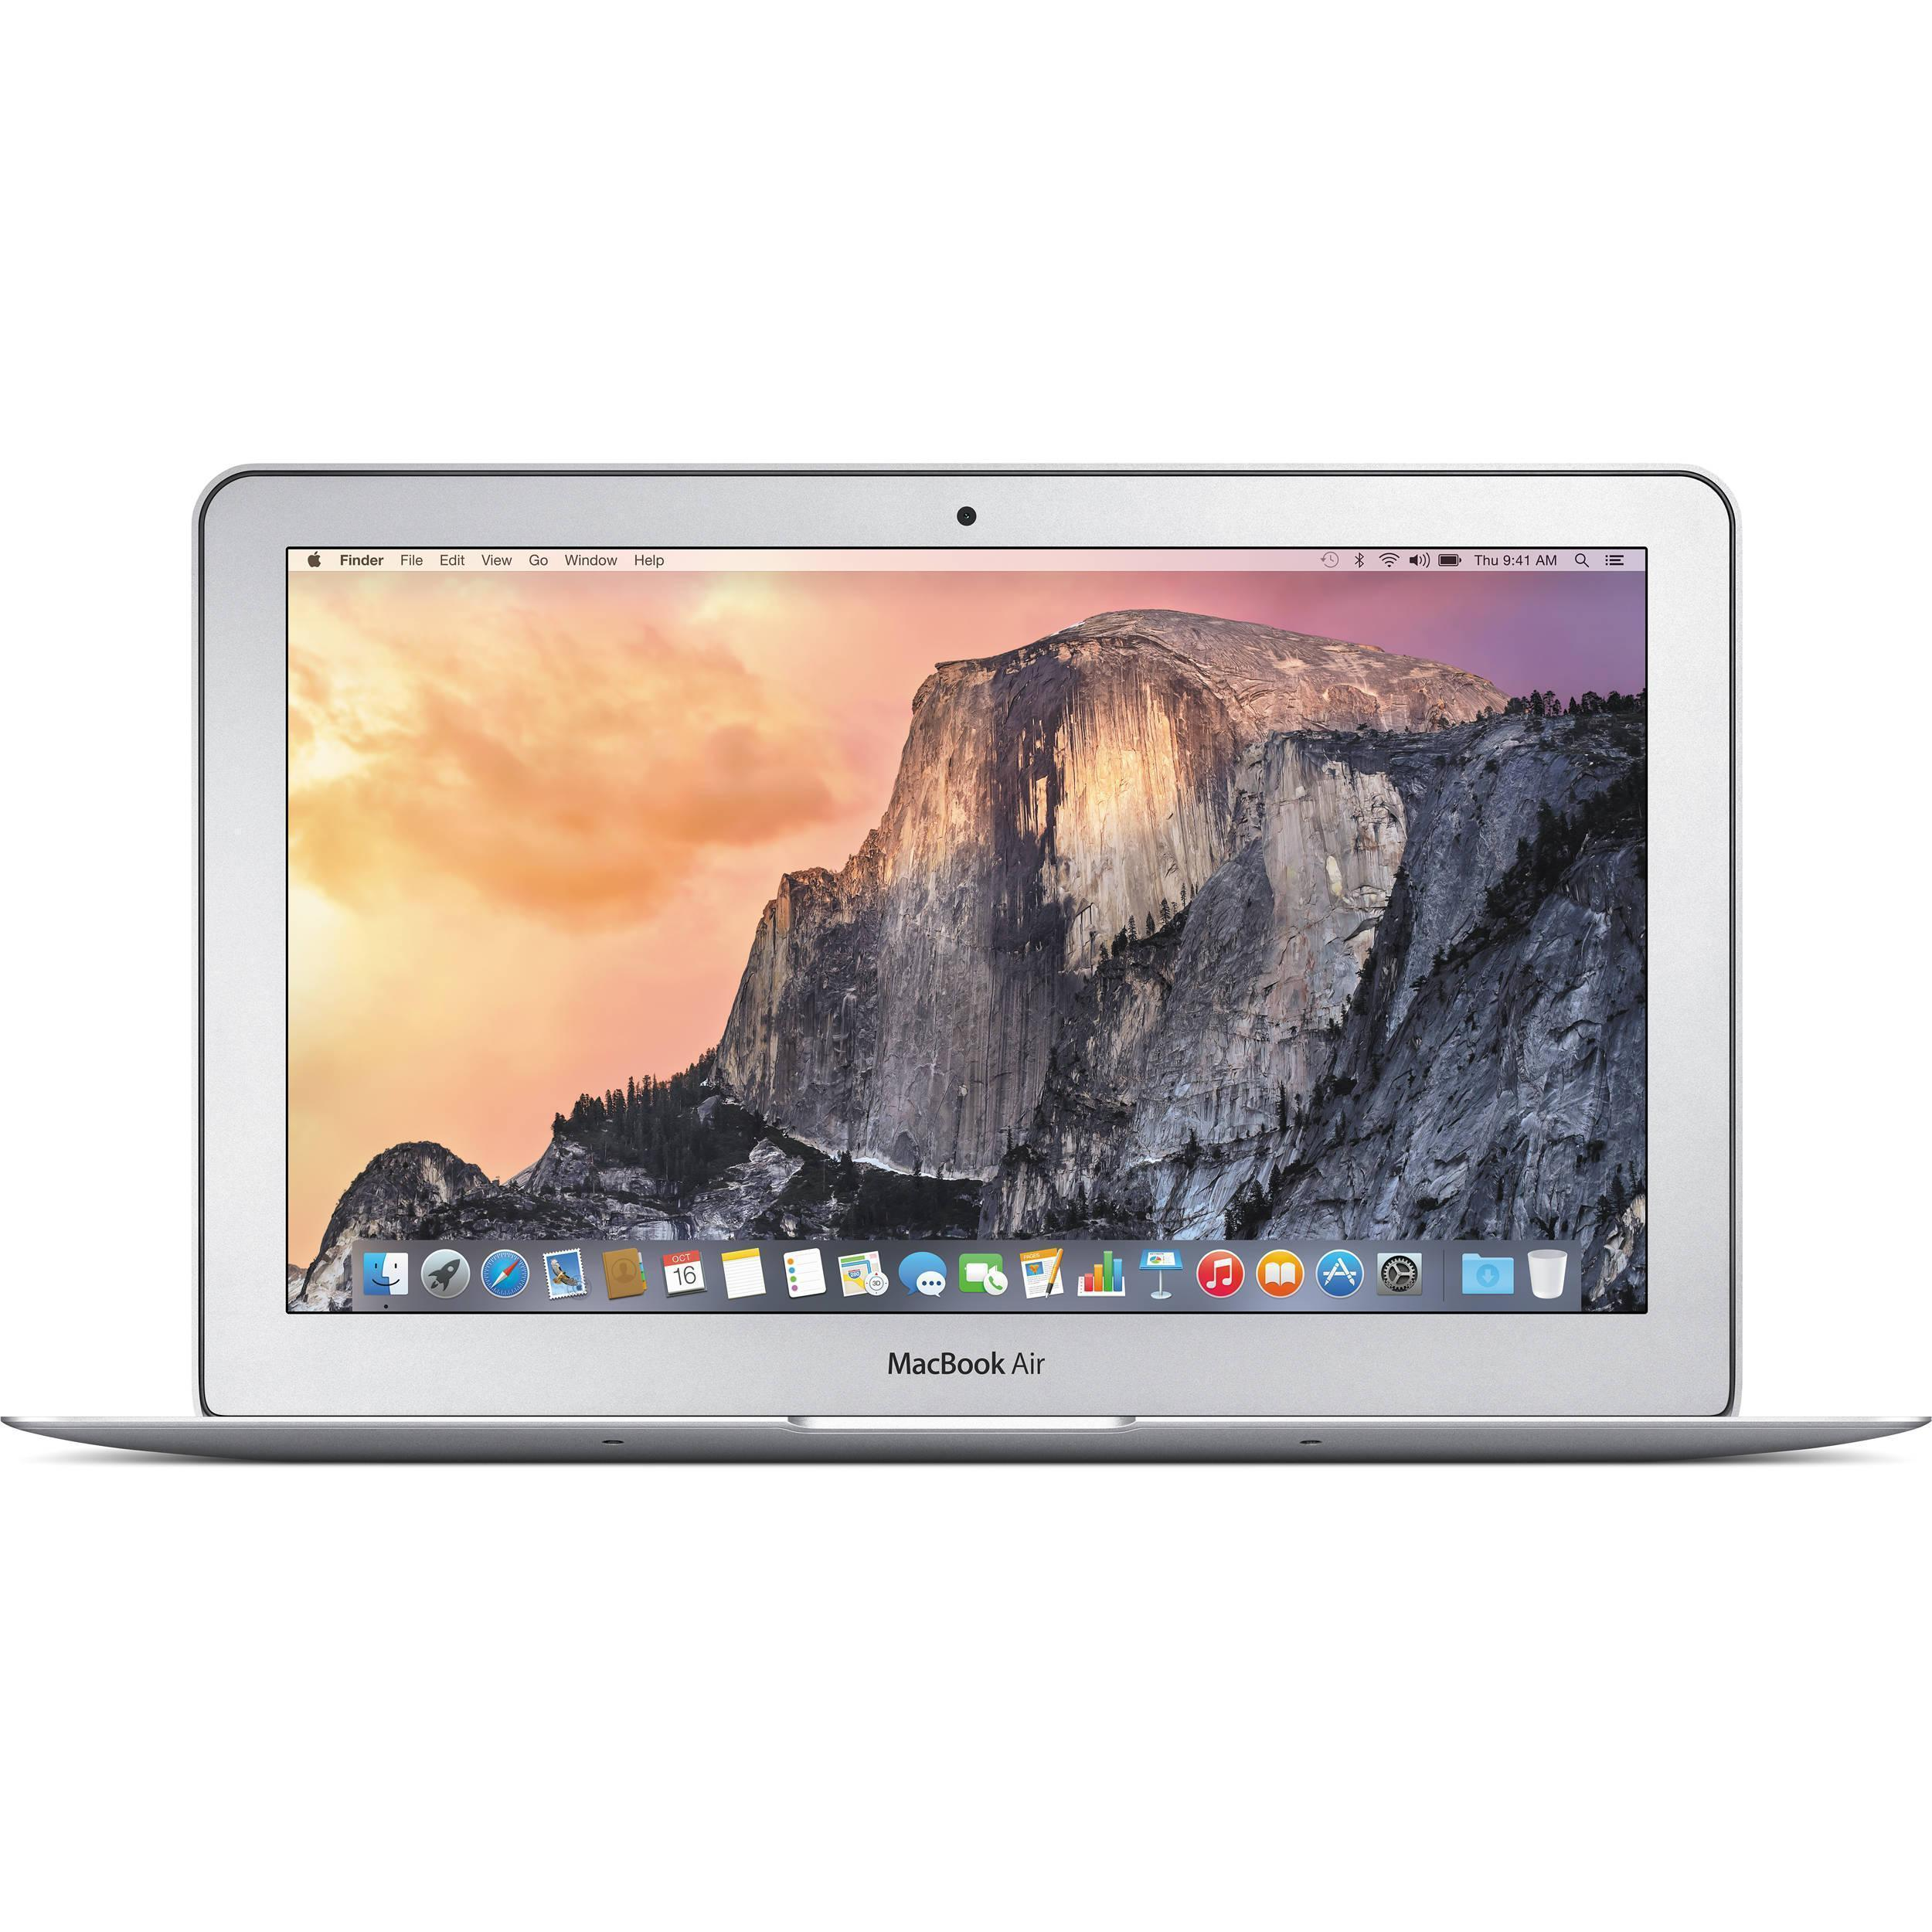 MacBook Air 11,6-tum (2013) - Core i5 - 8GB - SSD 256 GB QWERTY - Engelska (Storbritannien)